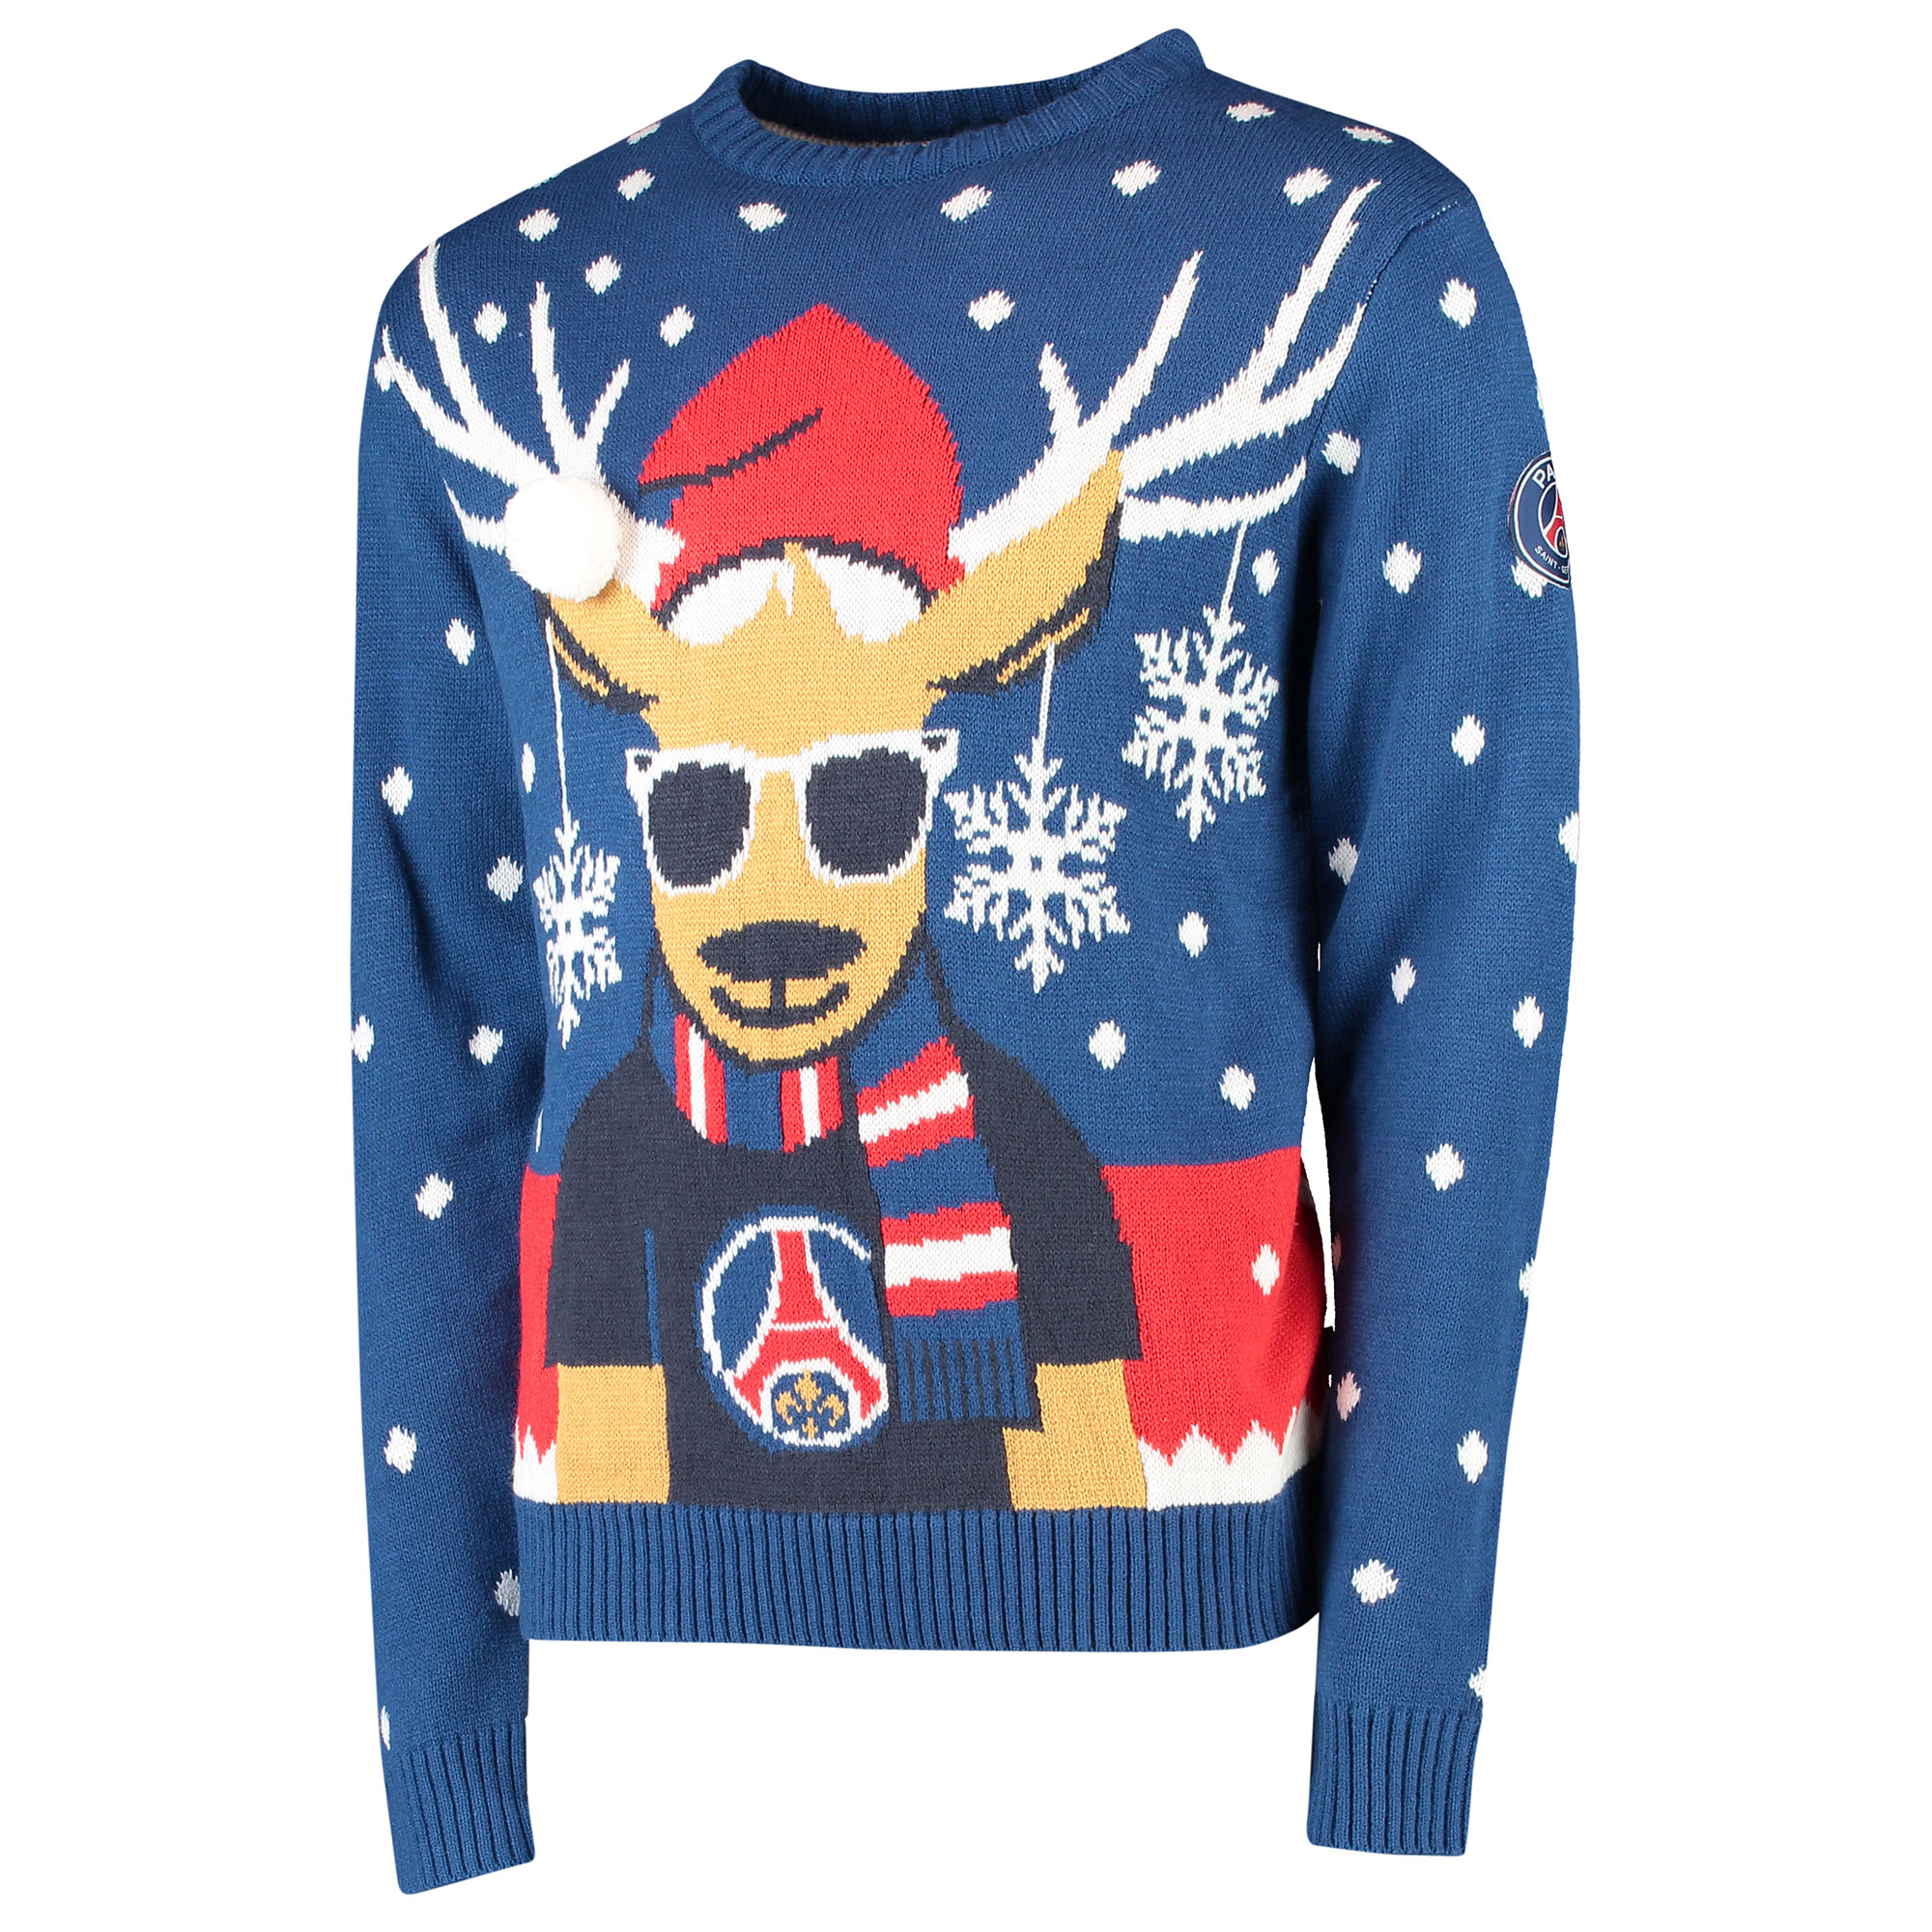 b41456d612e2 Paris Saint-Germain FC - PSG vianočný sveter pánsky - SKLADOM